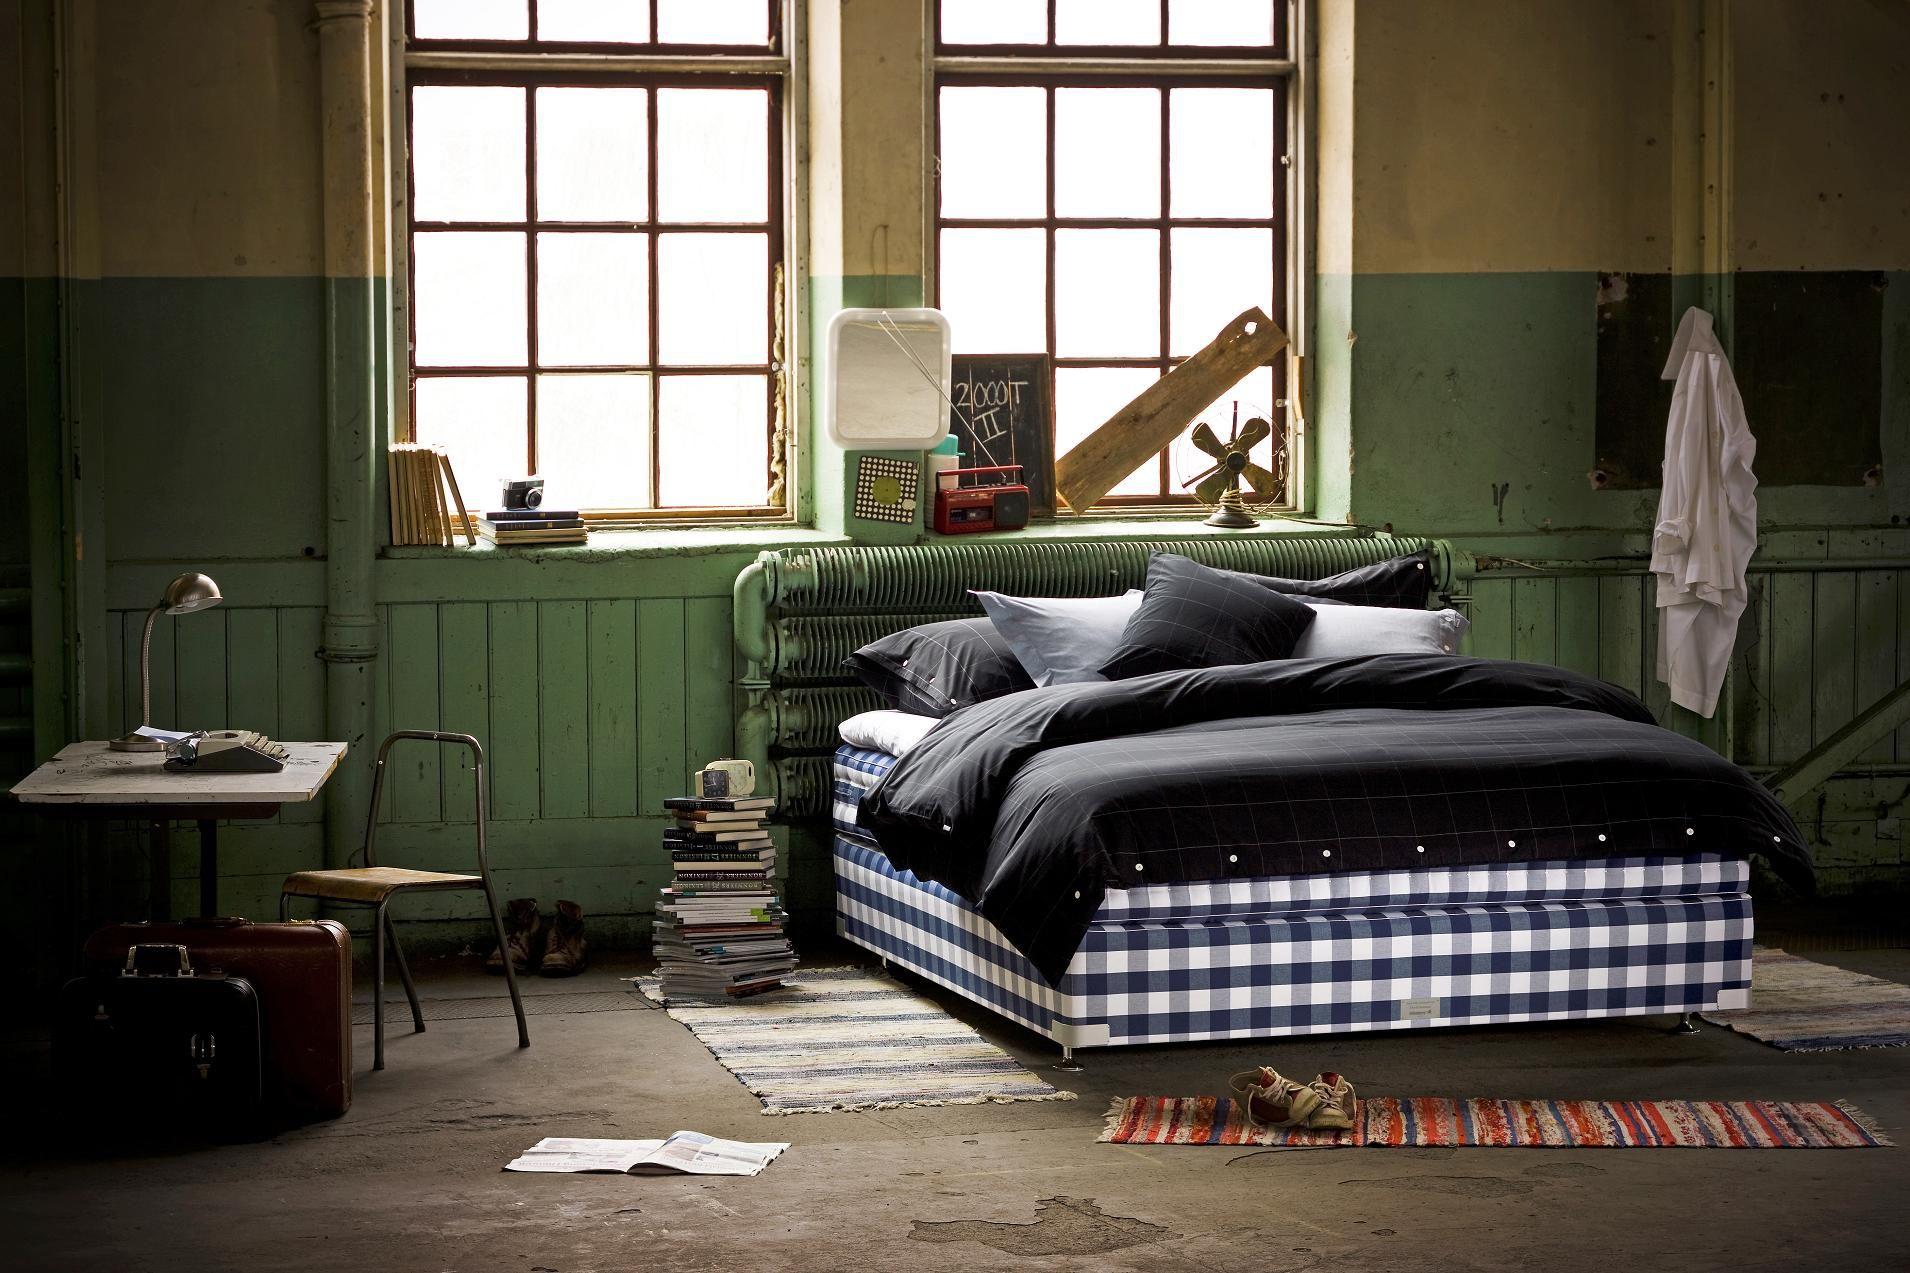 Luxurioses Bett Hastens Tradition Und Innovation | Möbelideen